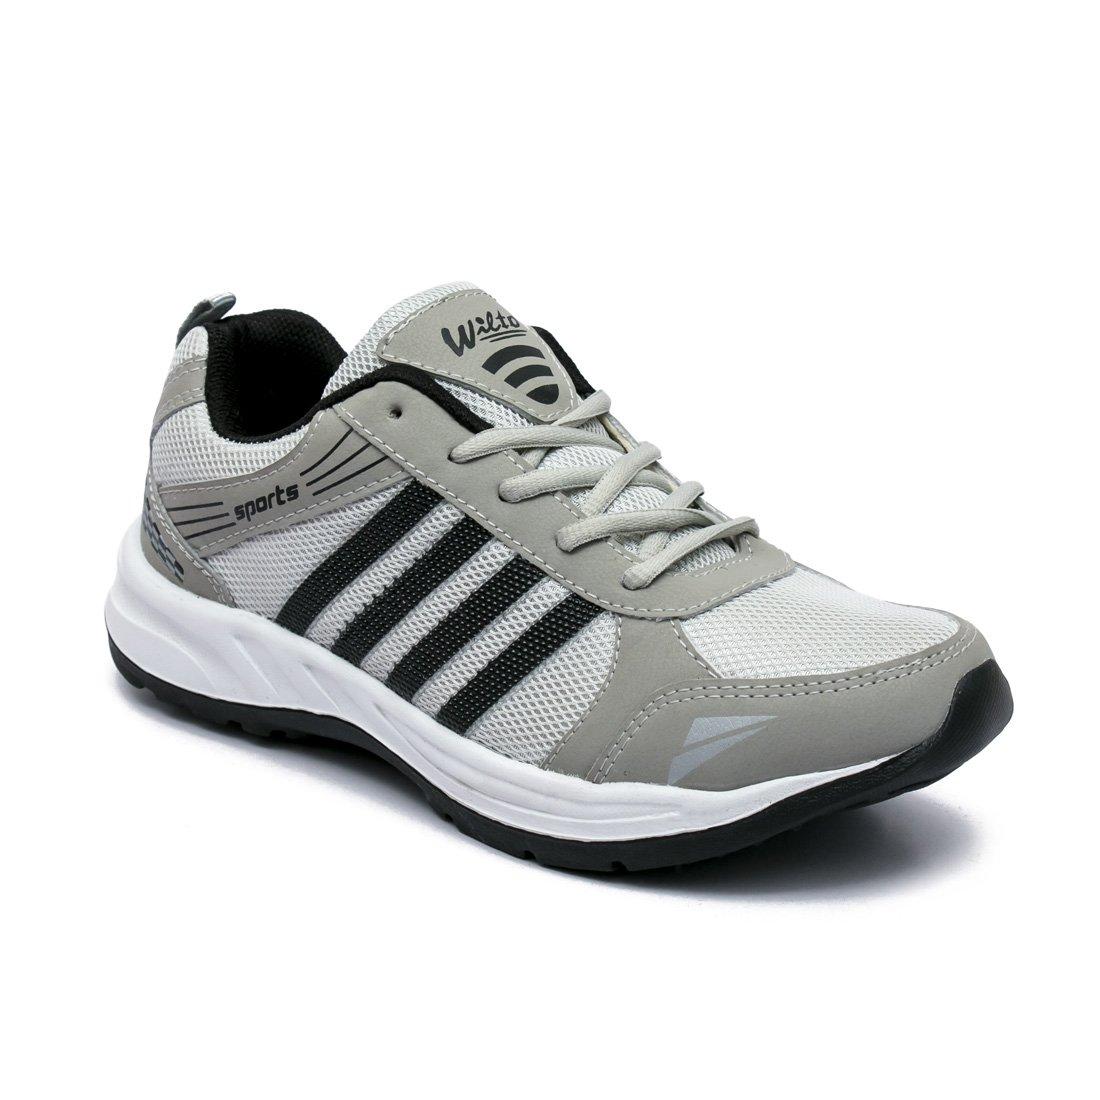 a1d44aea860c2 ASIAN Wonder-13 Grey Black Running Shoes for Men